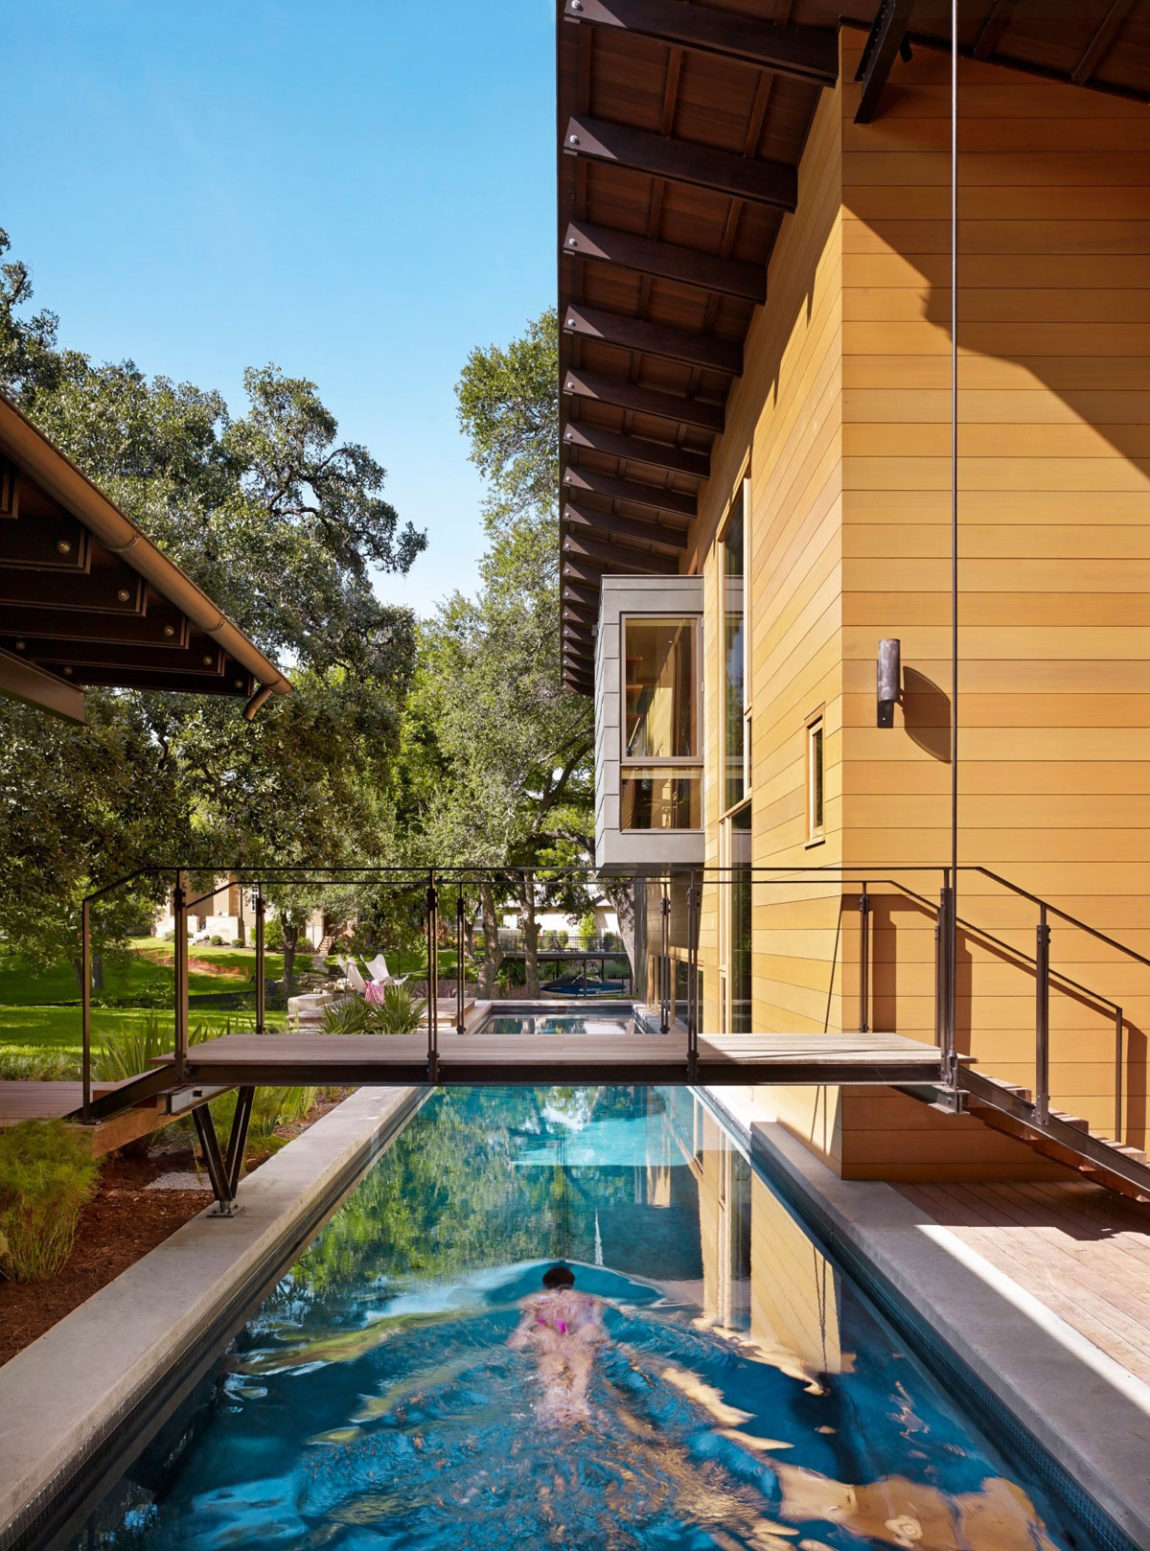 Hog Pen Creek Residence by Lake Flato Architects (8)